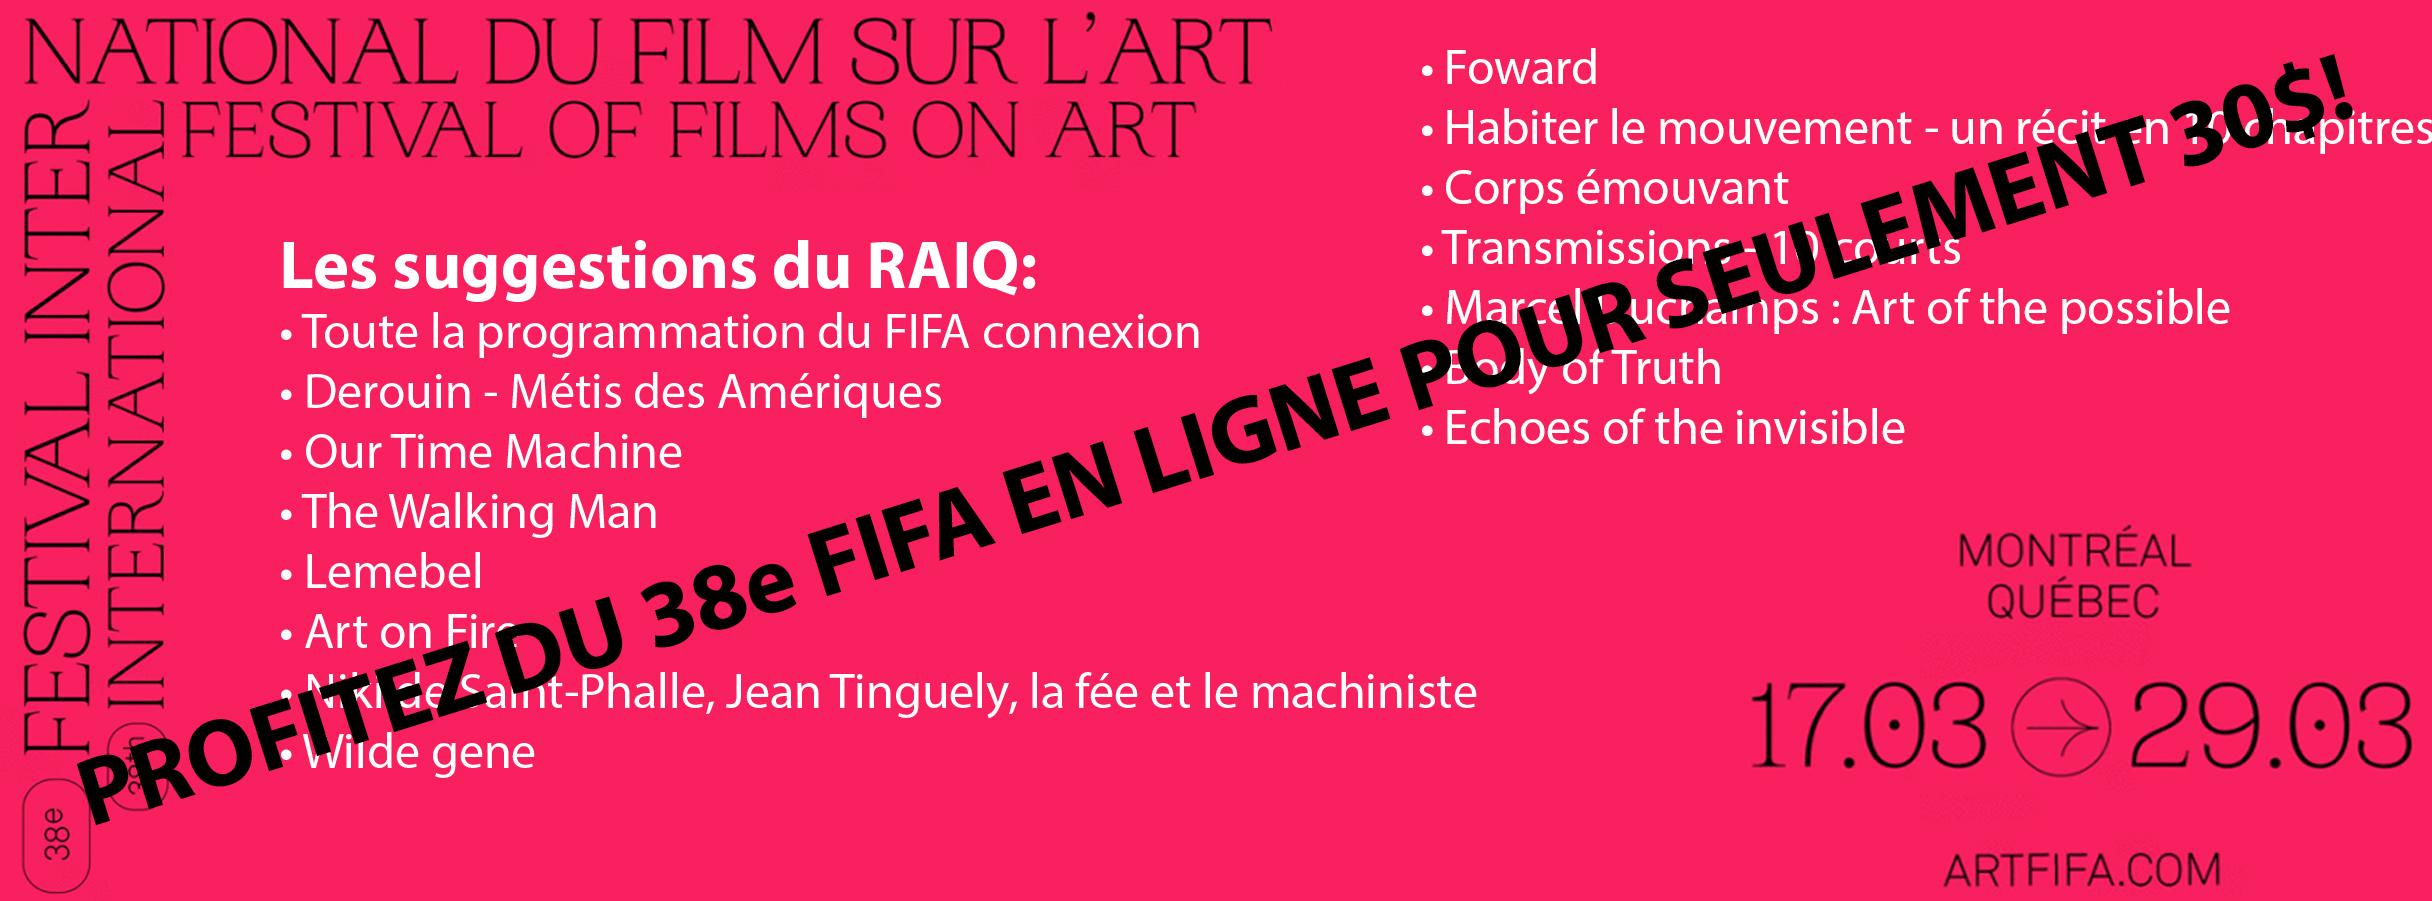 38e FIFA EN LIGNE!